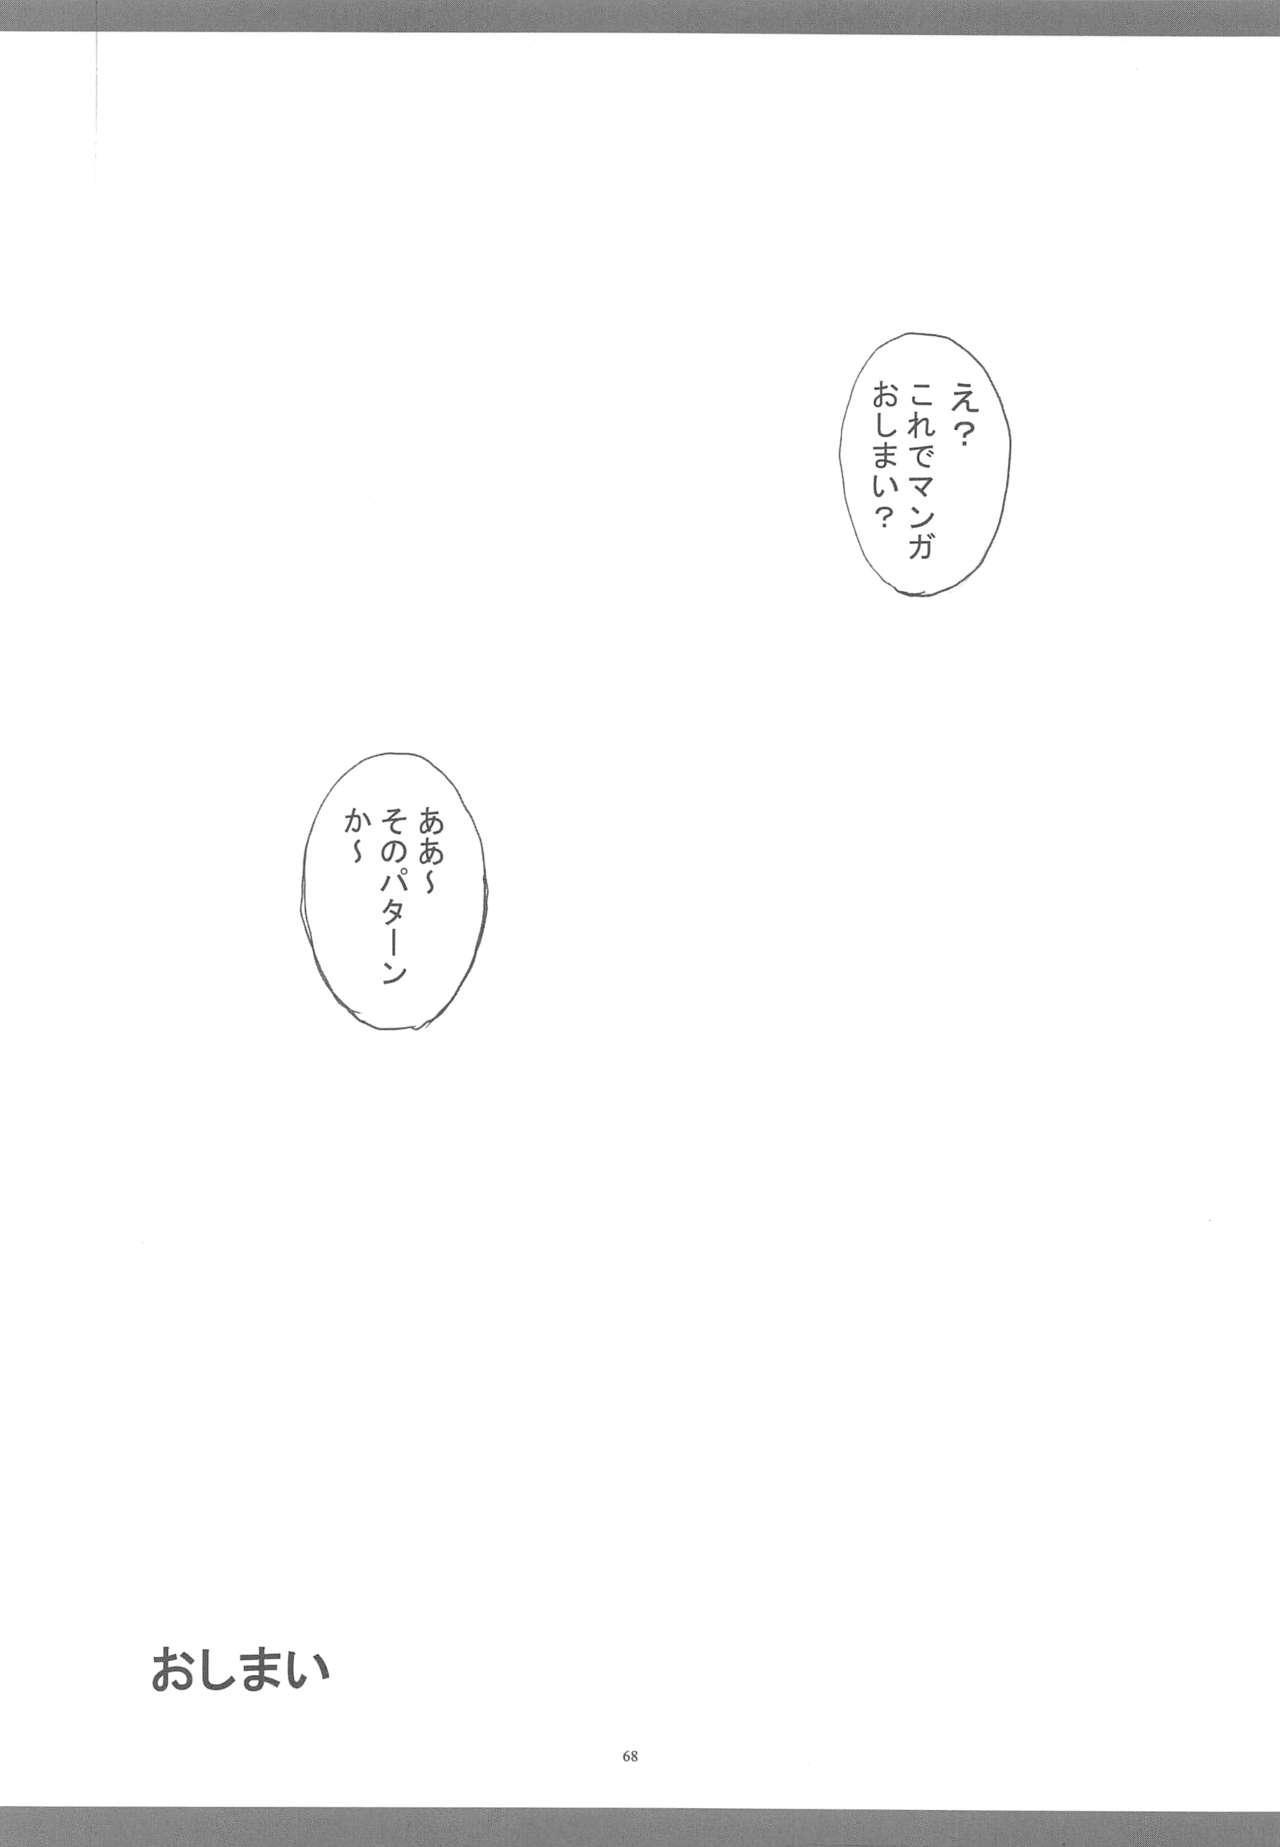 KyoAni Kaishaku KyoAni Soushuuhen 64